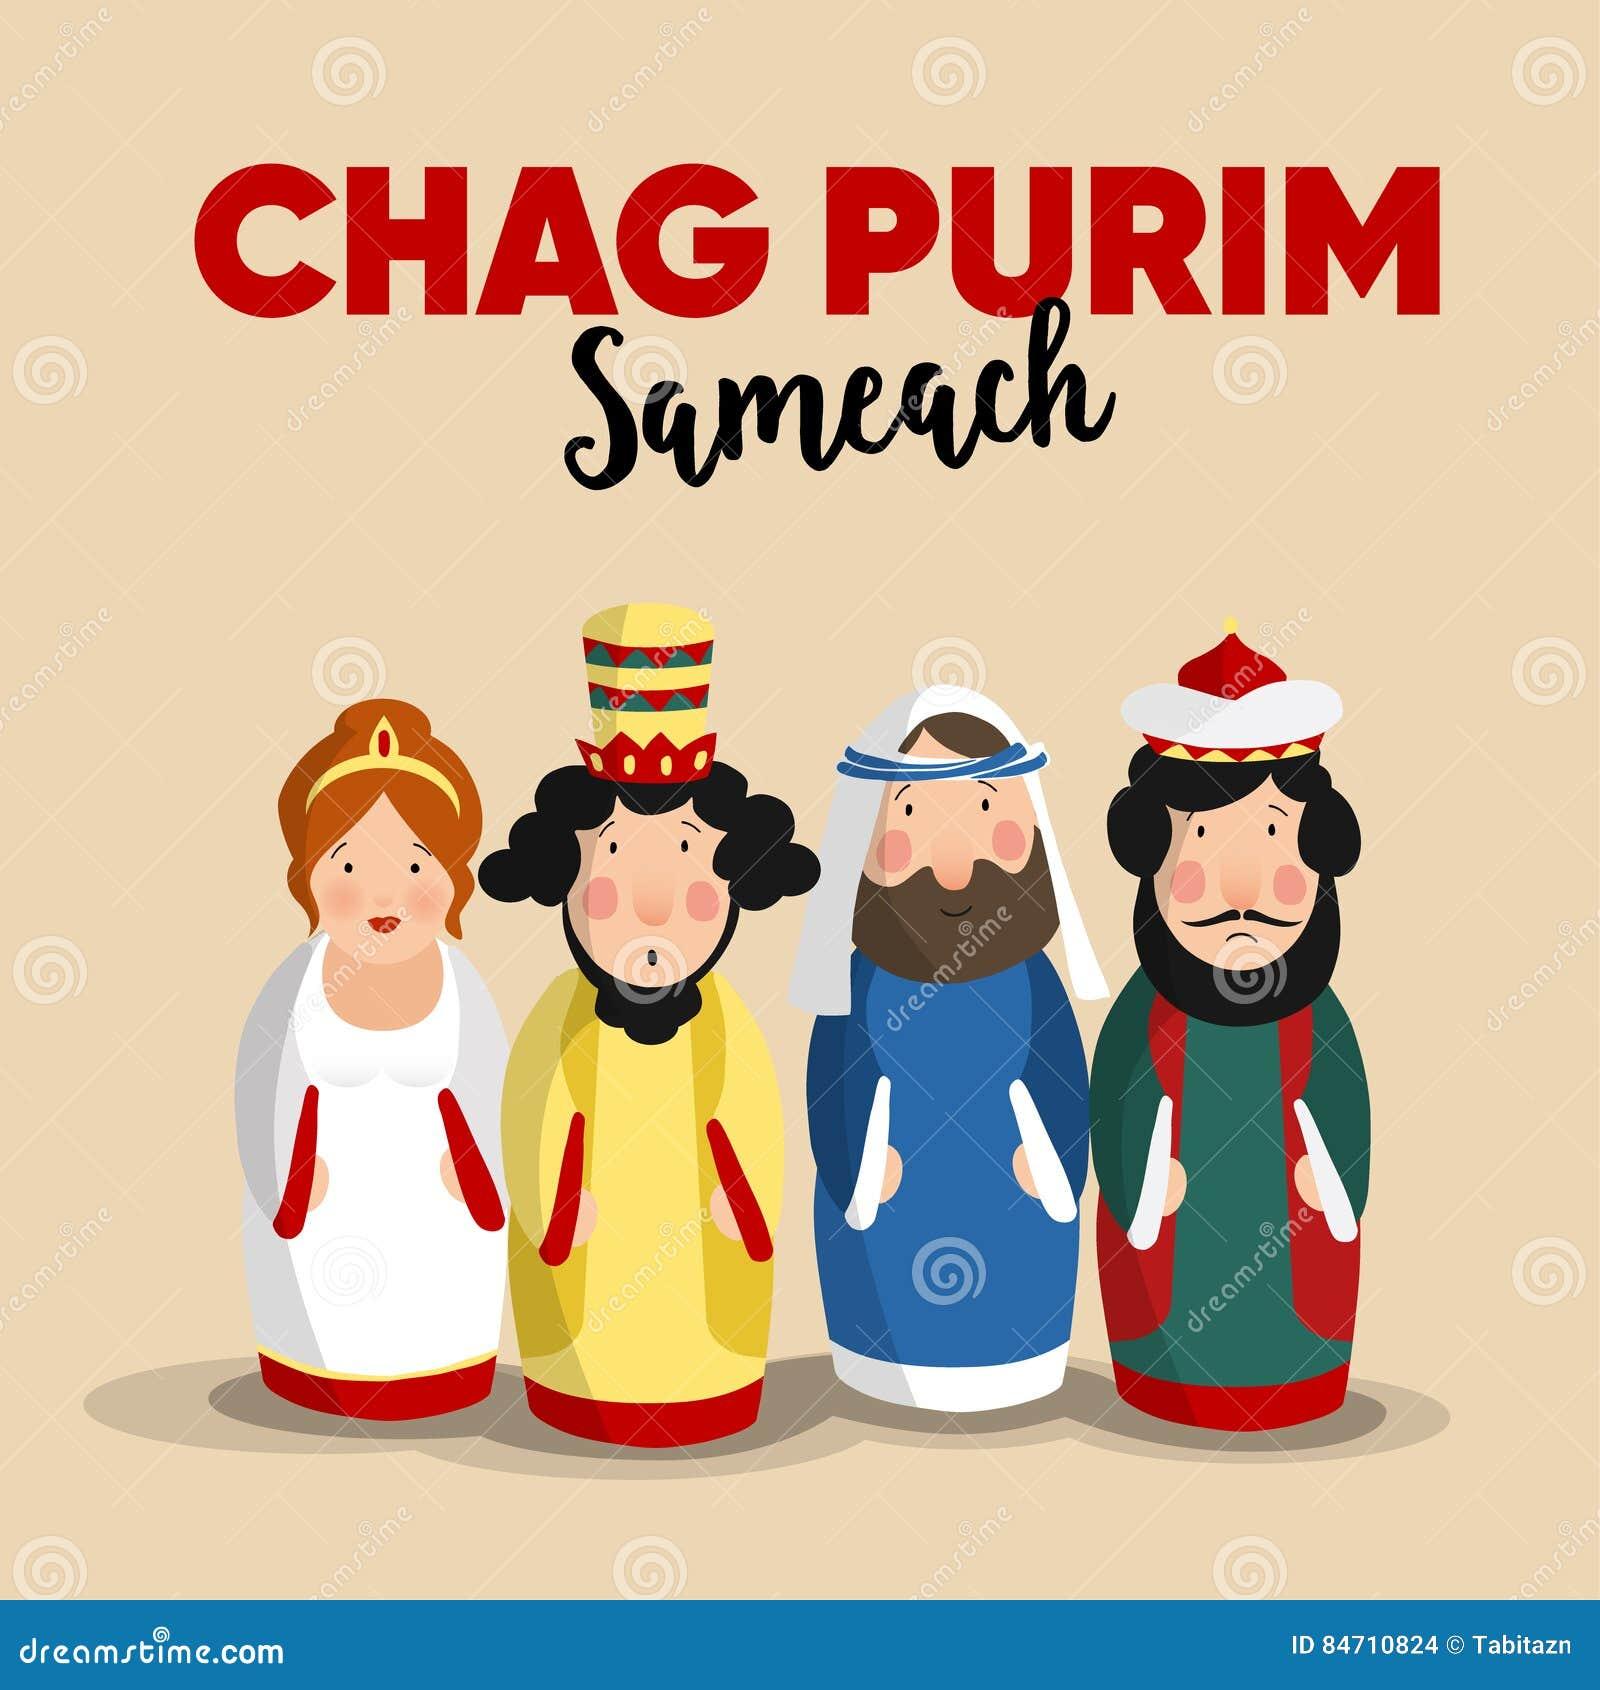 Chag Purim Sameach Holiday Greeting Card For The Jewish Festival ...